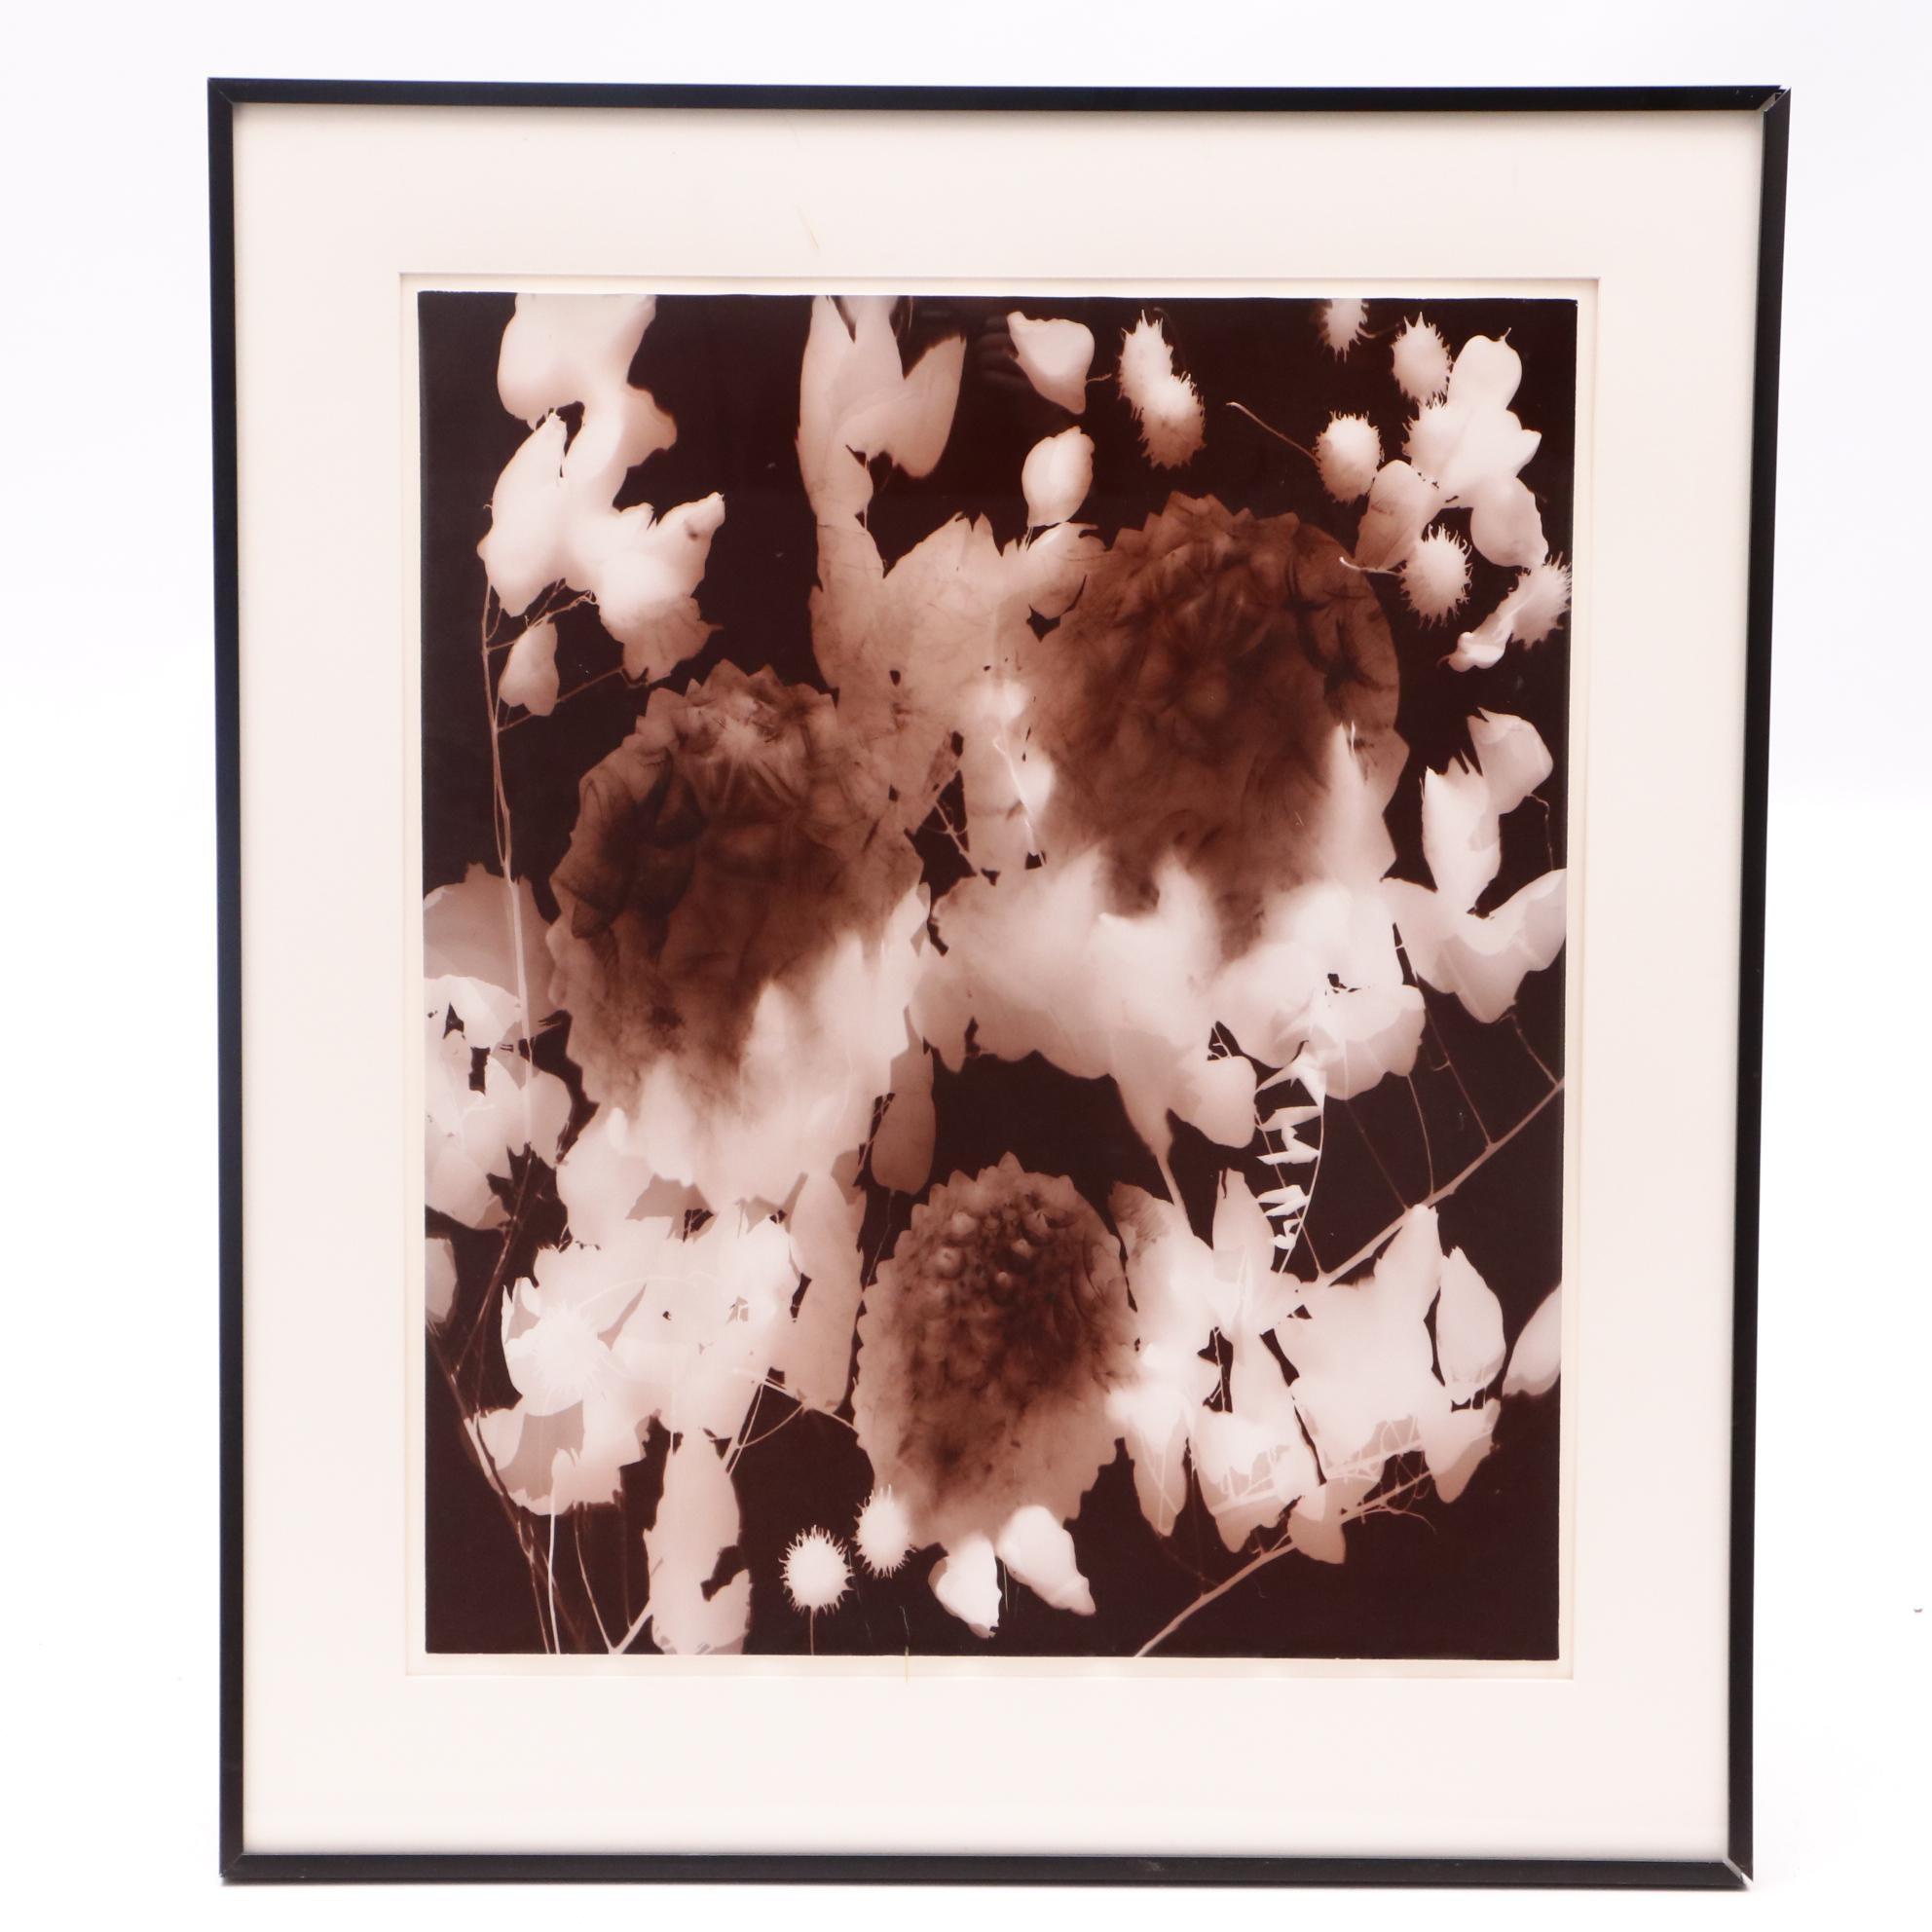 Anita Douthat Photogram of Botanical Forms